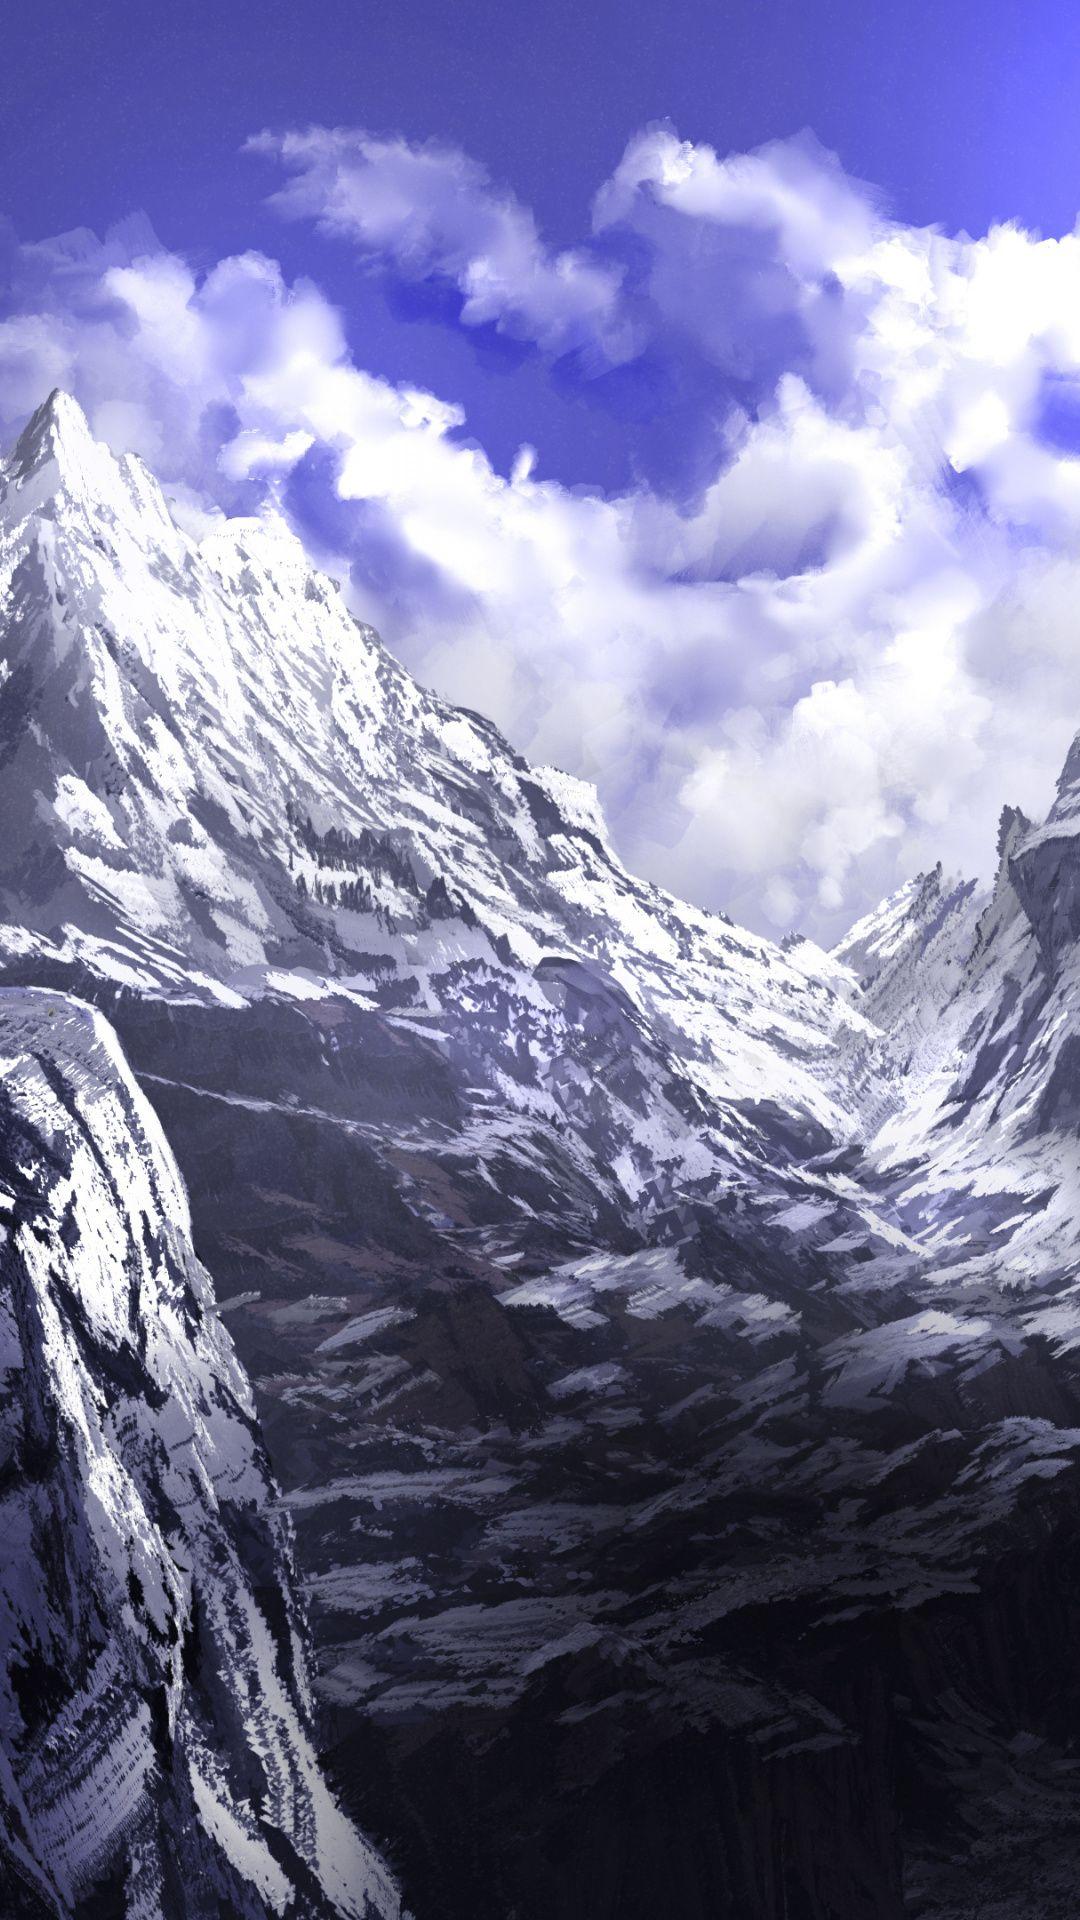 Anime Mountains Summit Art 1080x1920 Wallpaper Mountain Art